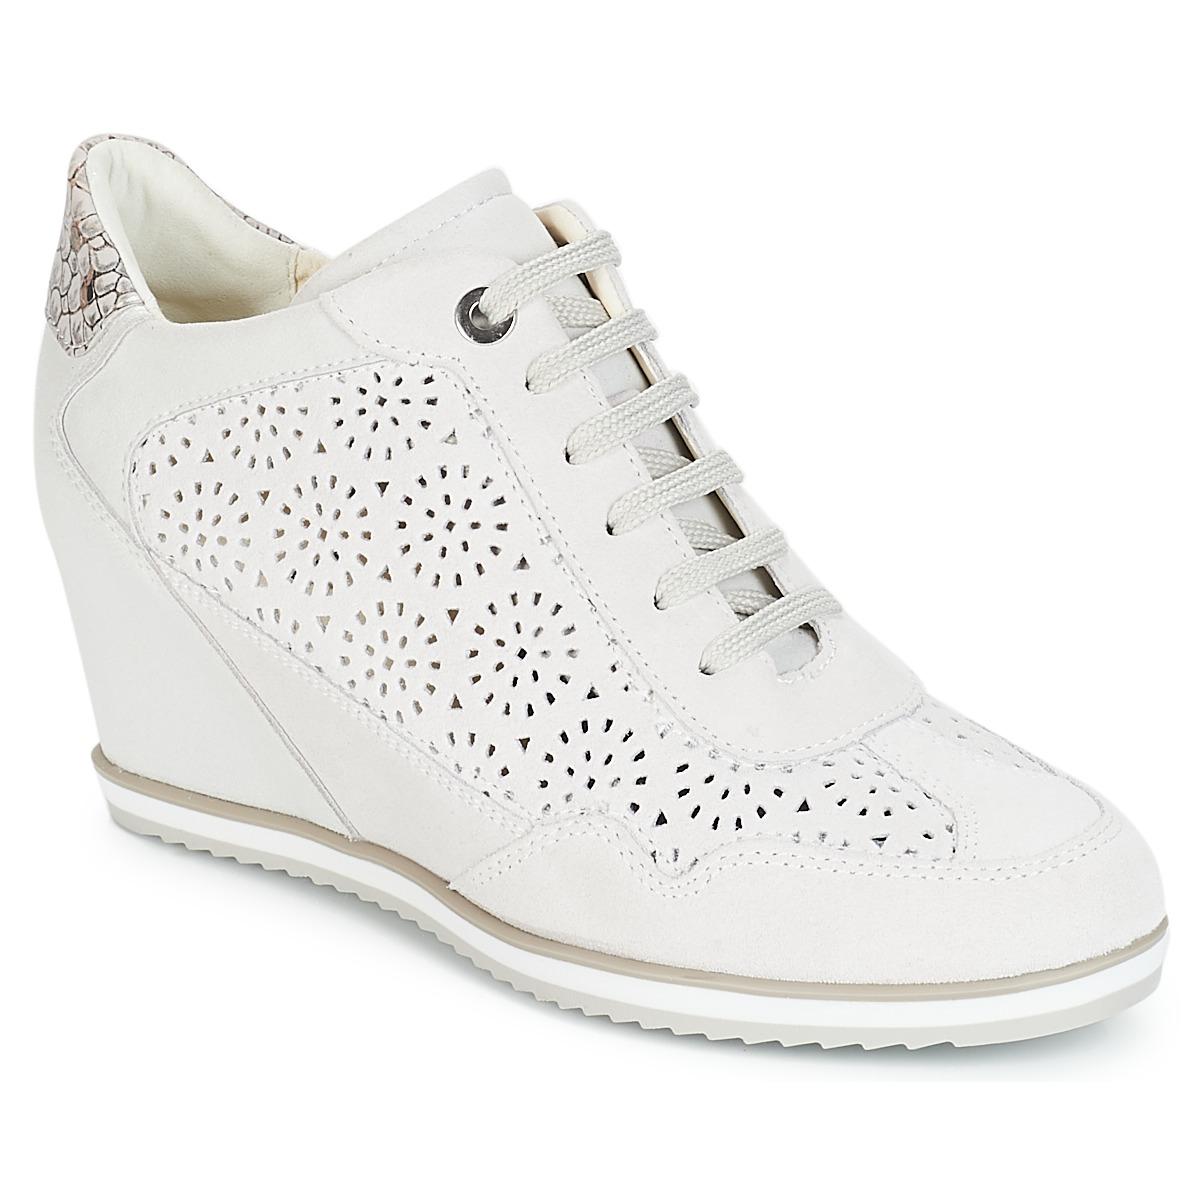 Geox D ILLUSION Weiss - Kostenloser Versand bei Spartoode ! - Schuhe Sneaker High Damen 101,50 €